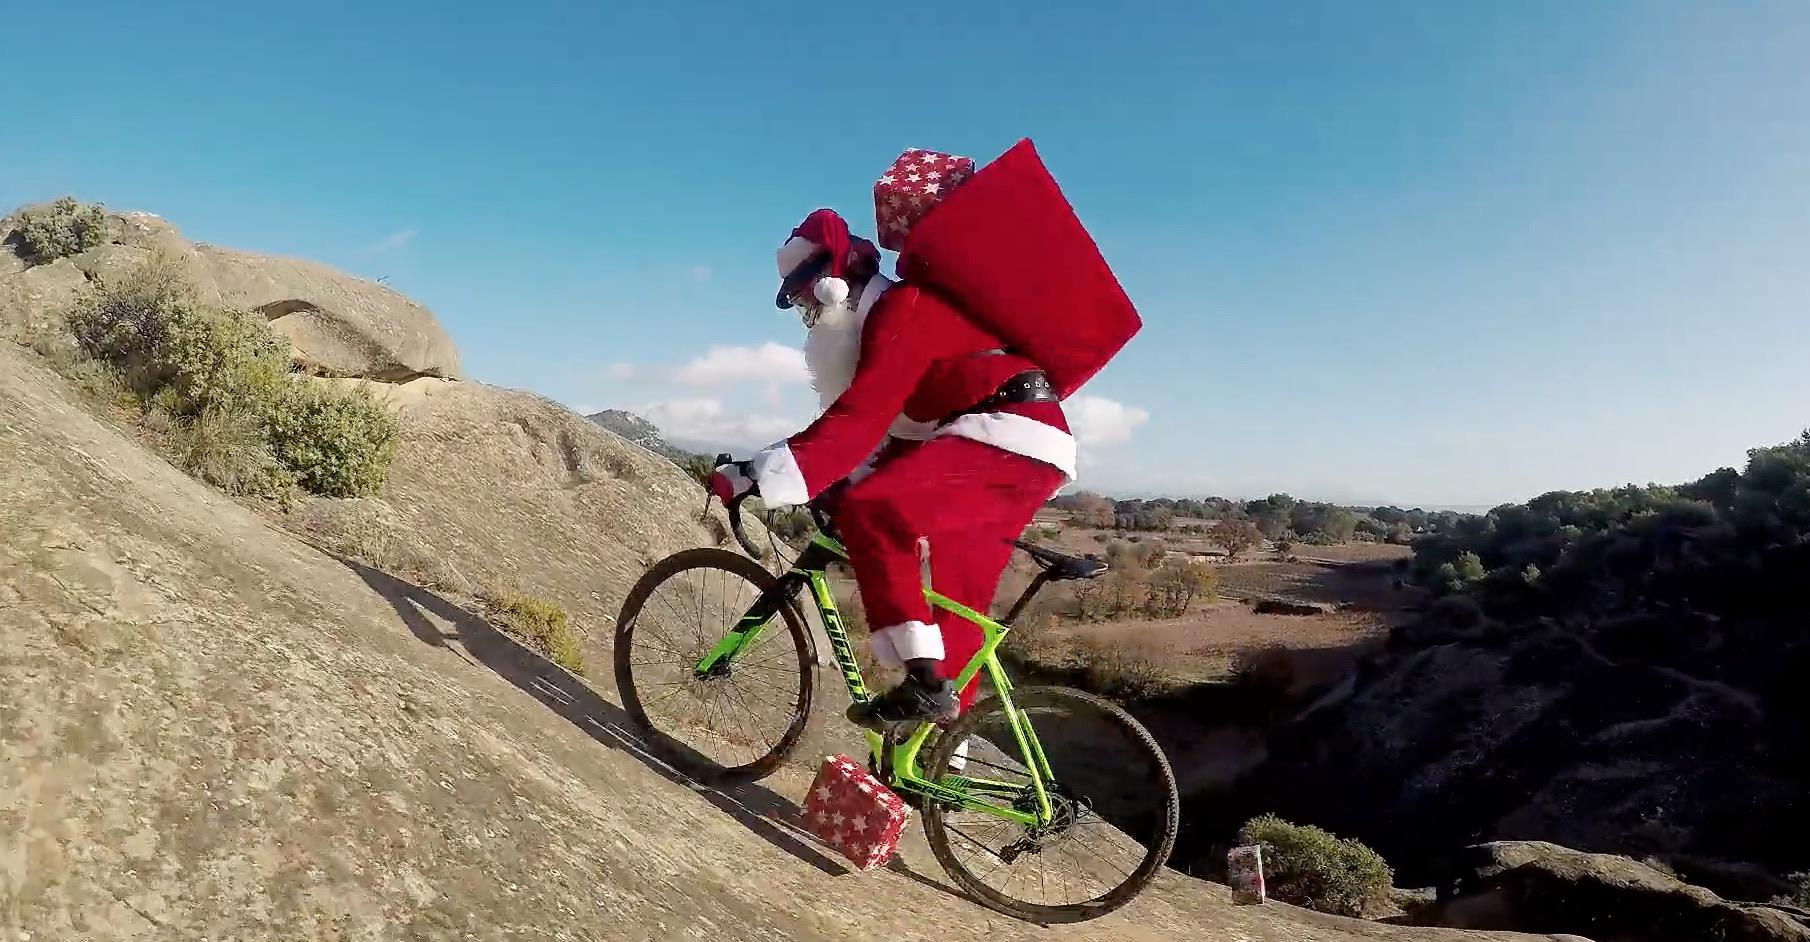 Babbo Natale In Bicicletta.Babbo Natale Arriva In Bici Bdc Mag Com Bici Da Corsa